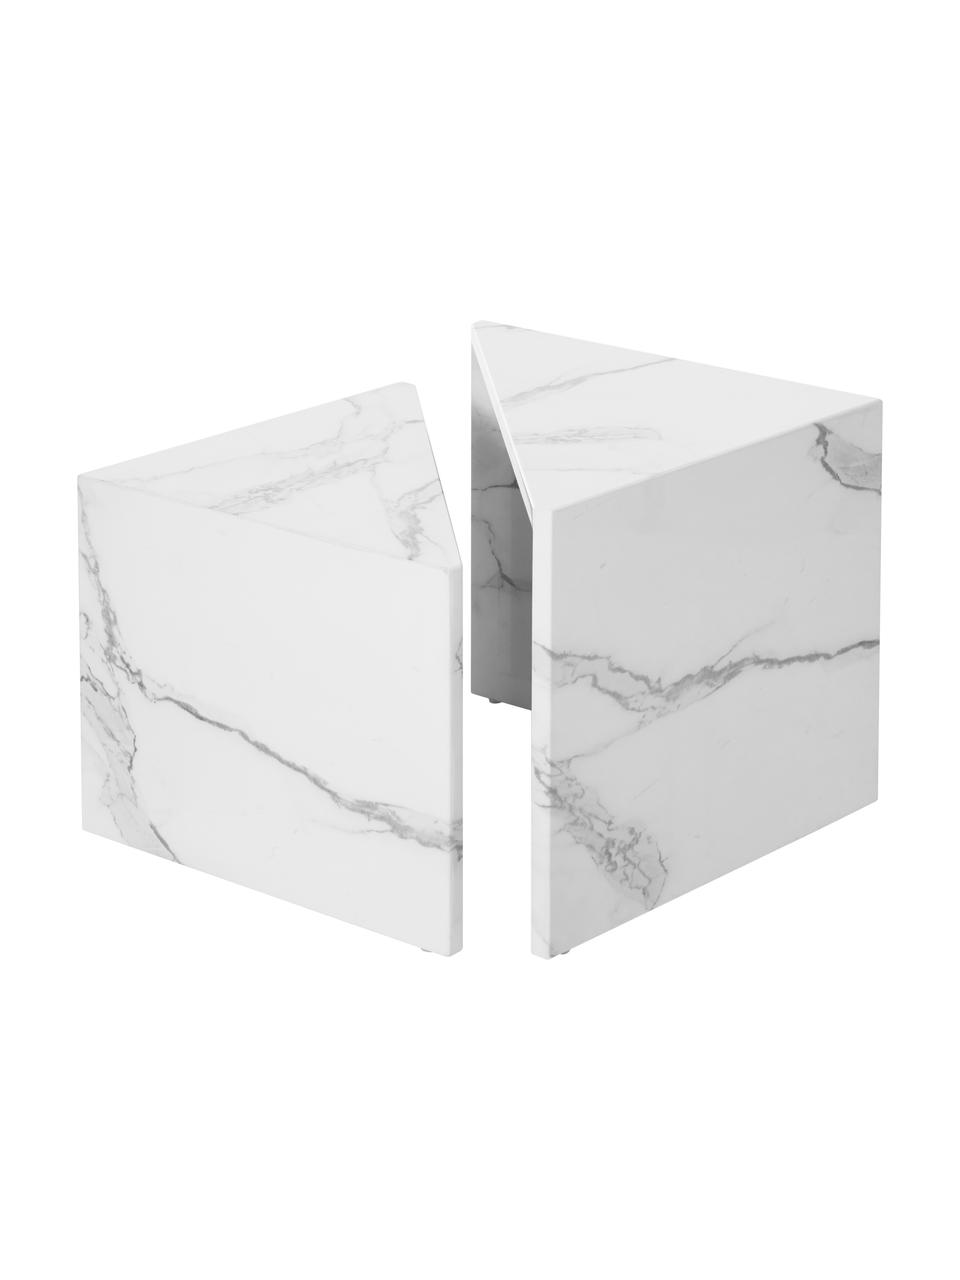 Table basse aspect marbre Vilma, 2 élém., Blanc, marbré, brillant